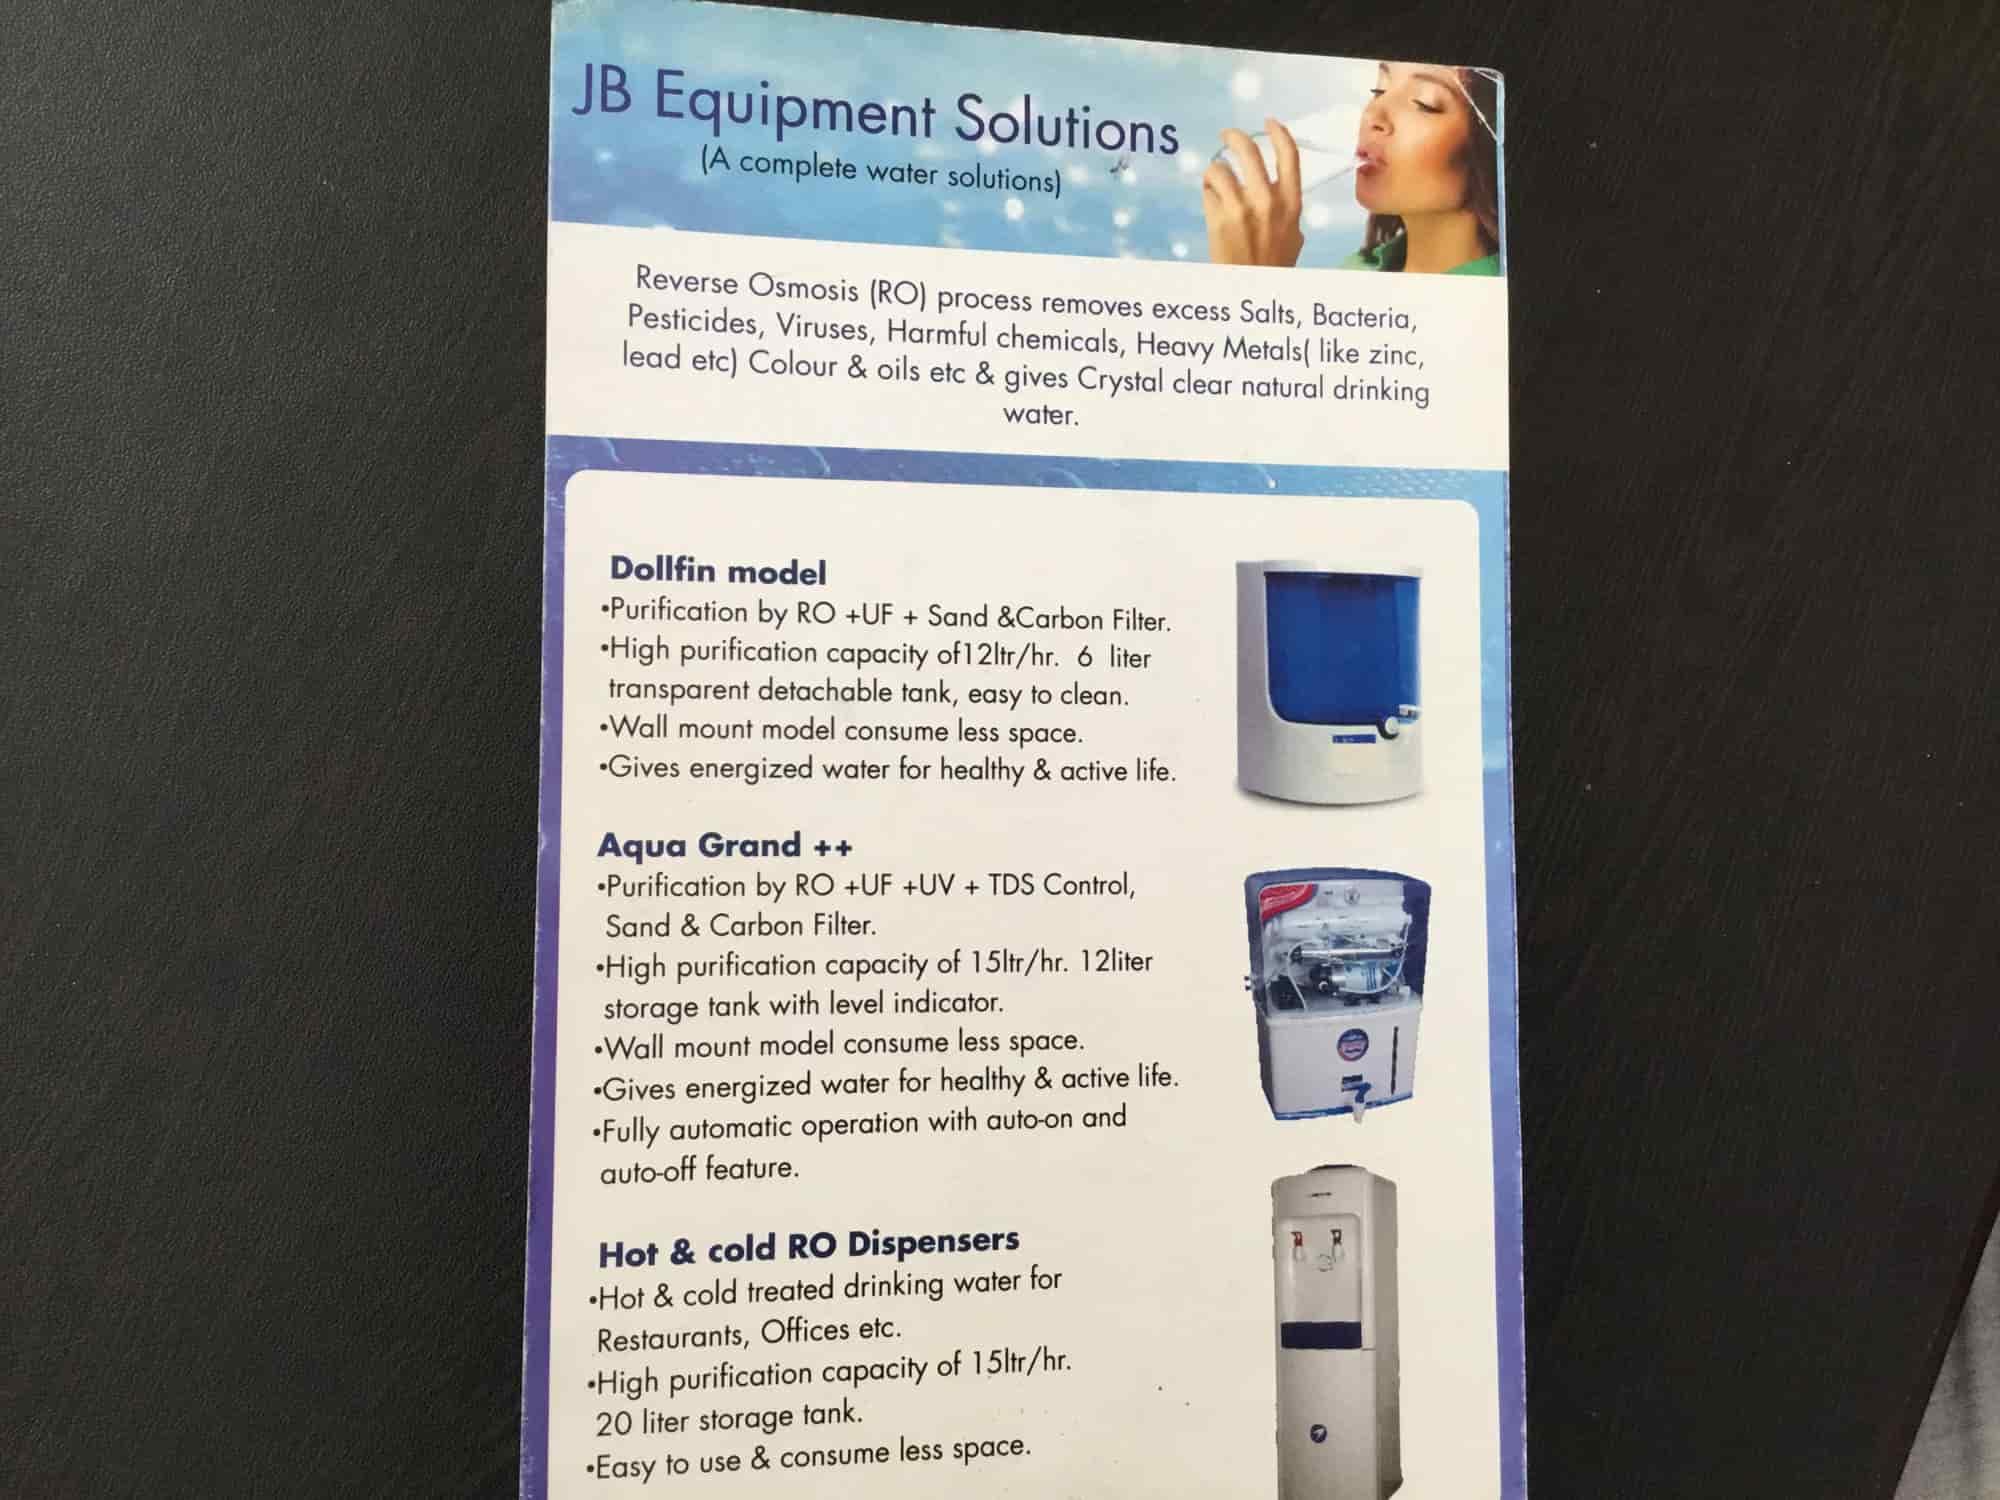 J B Equipment Solutions